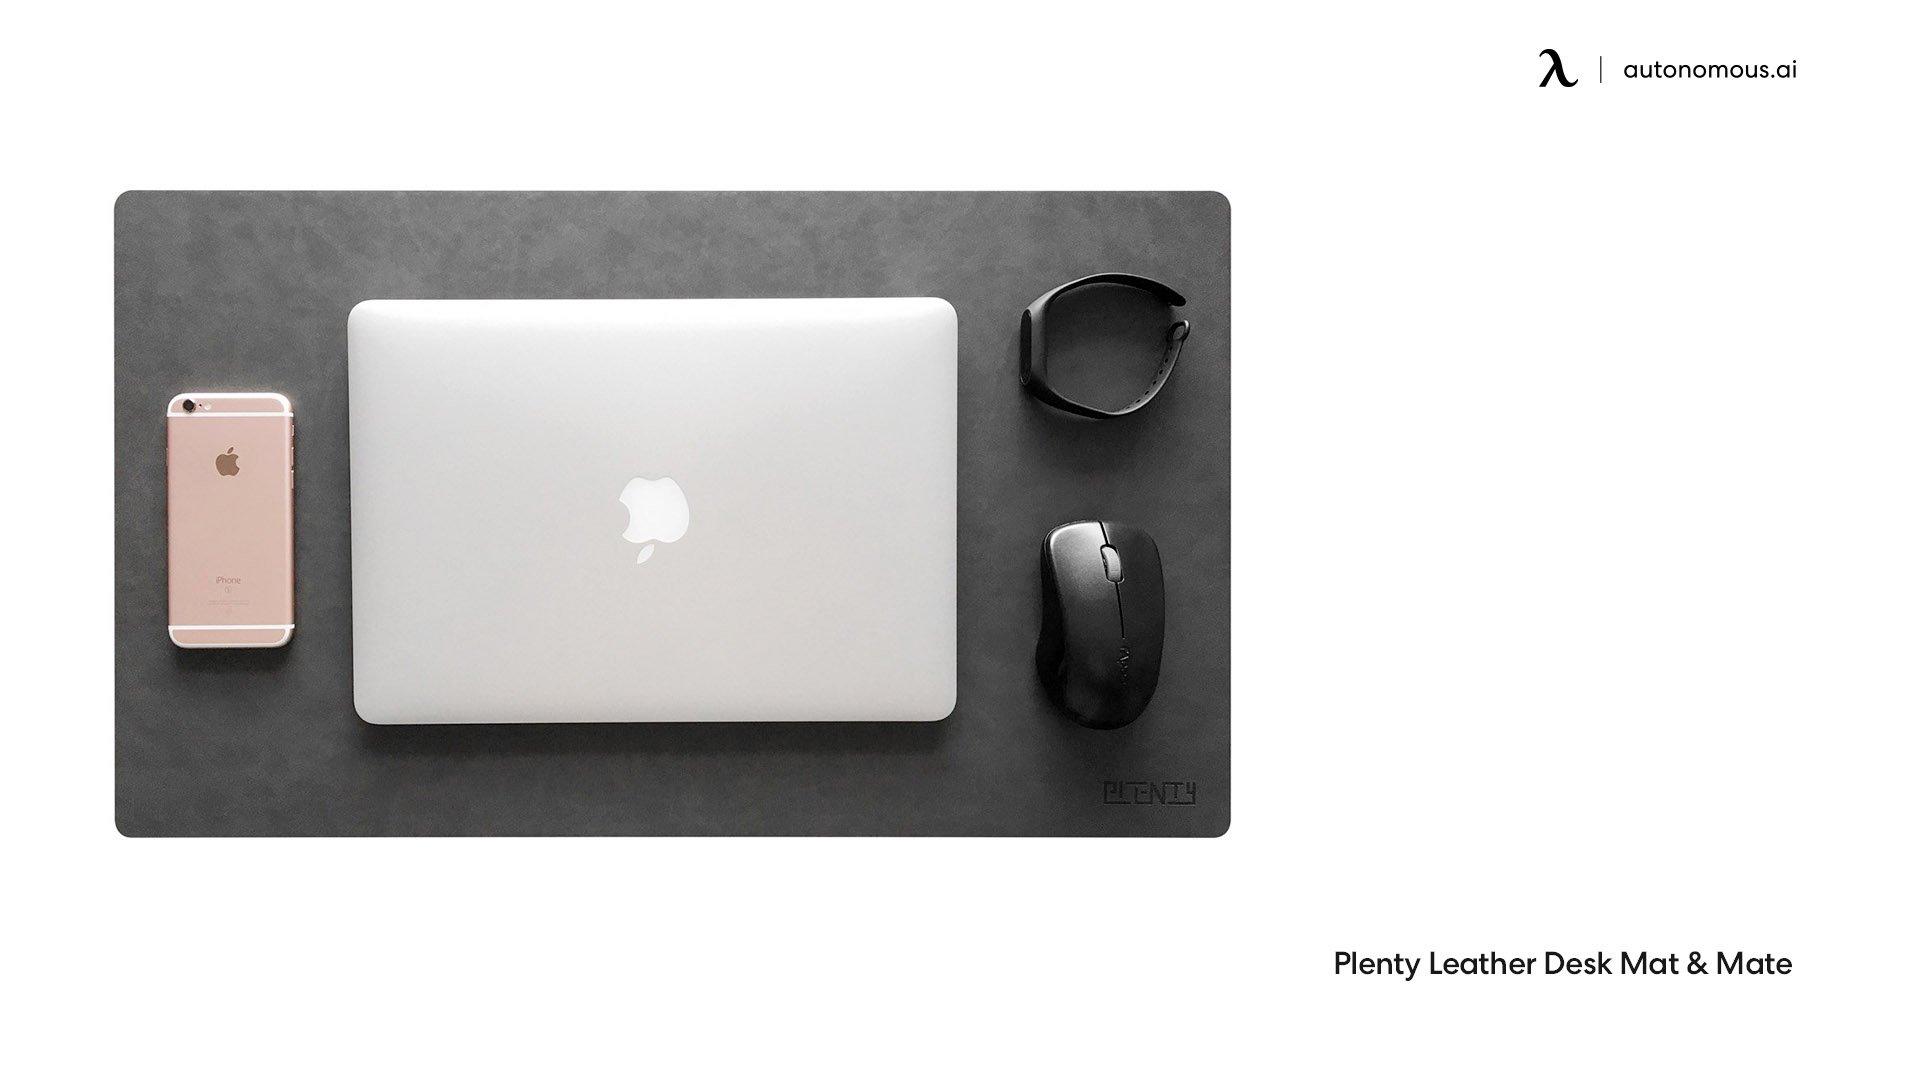 Plenty Leather Desk Mat & Mate